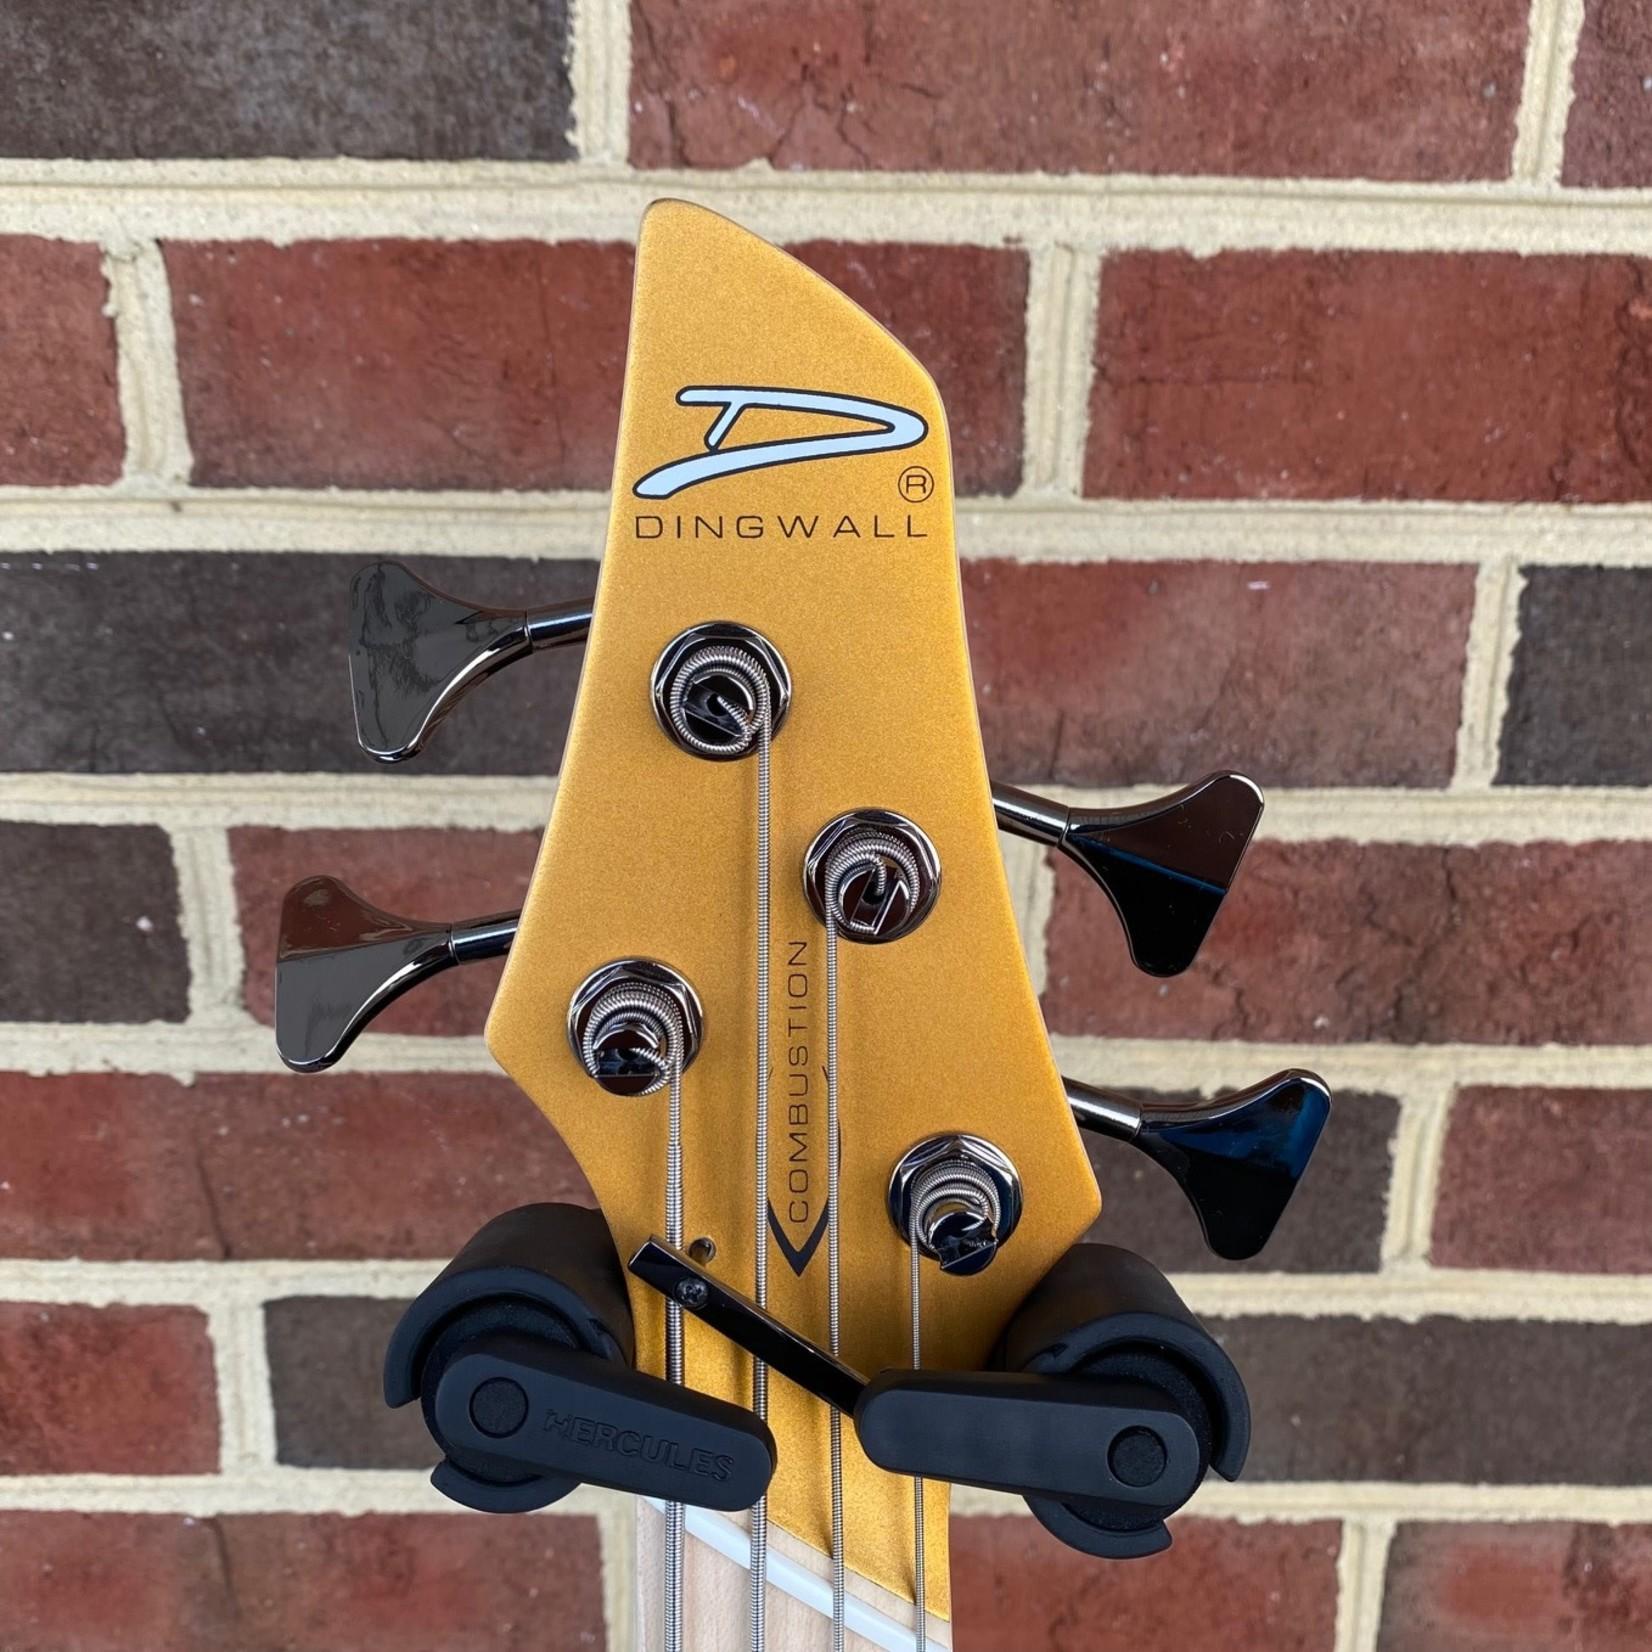 Dingwall Dingwall NG3 4-String, Matte Gold Metallic, Maple Fretboard, Matching Headstock, Dingwall Gig Bag, SN# 9214